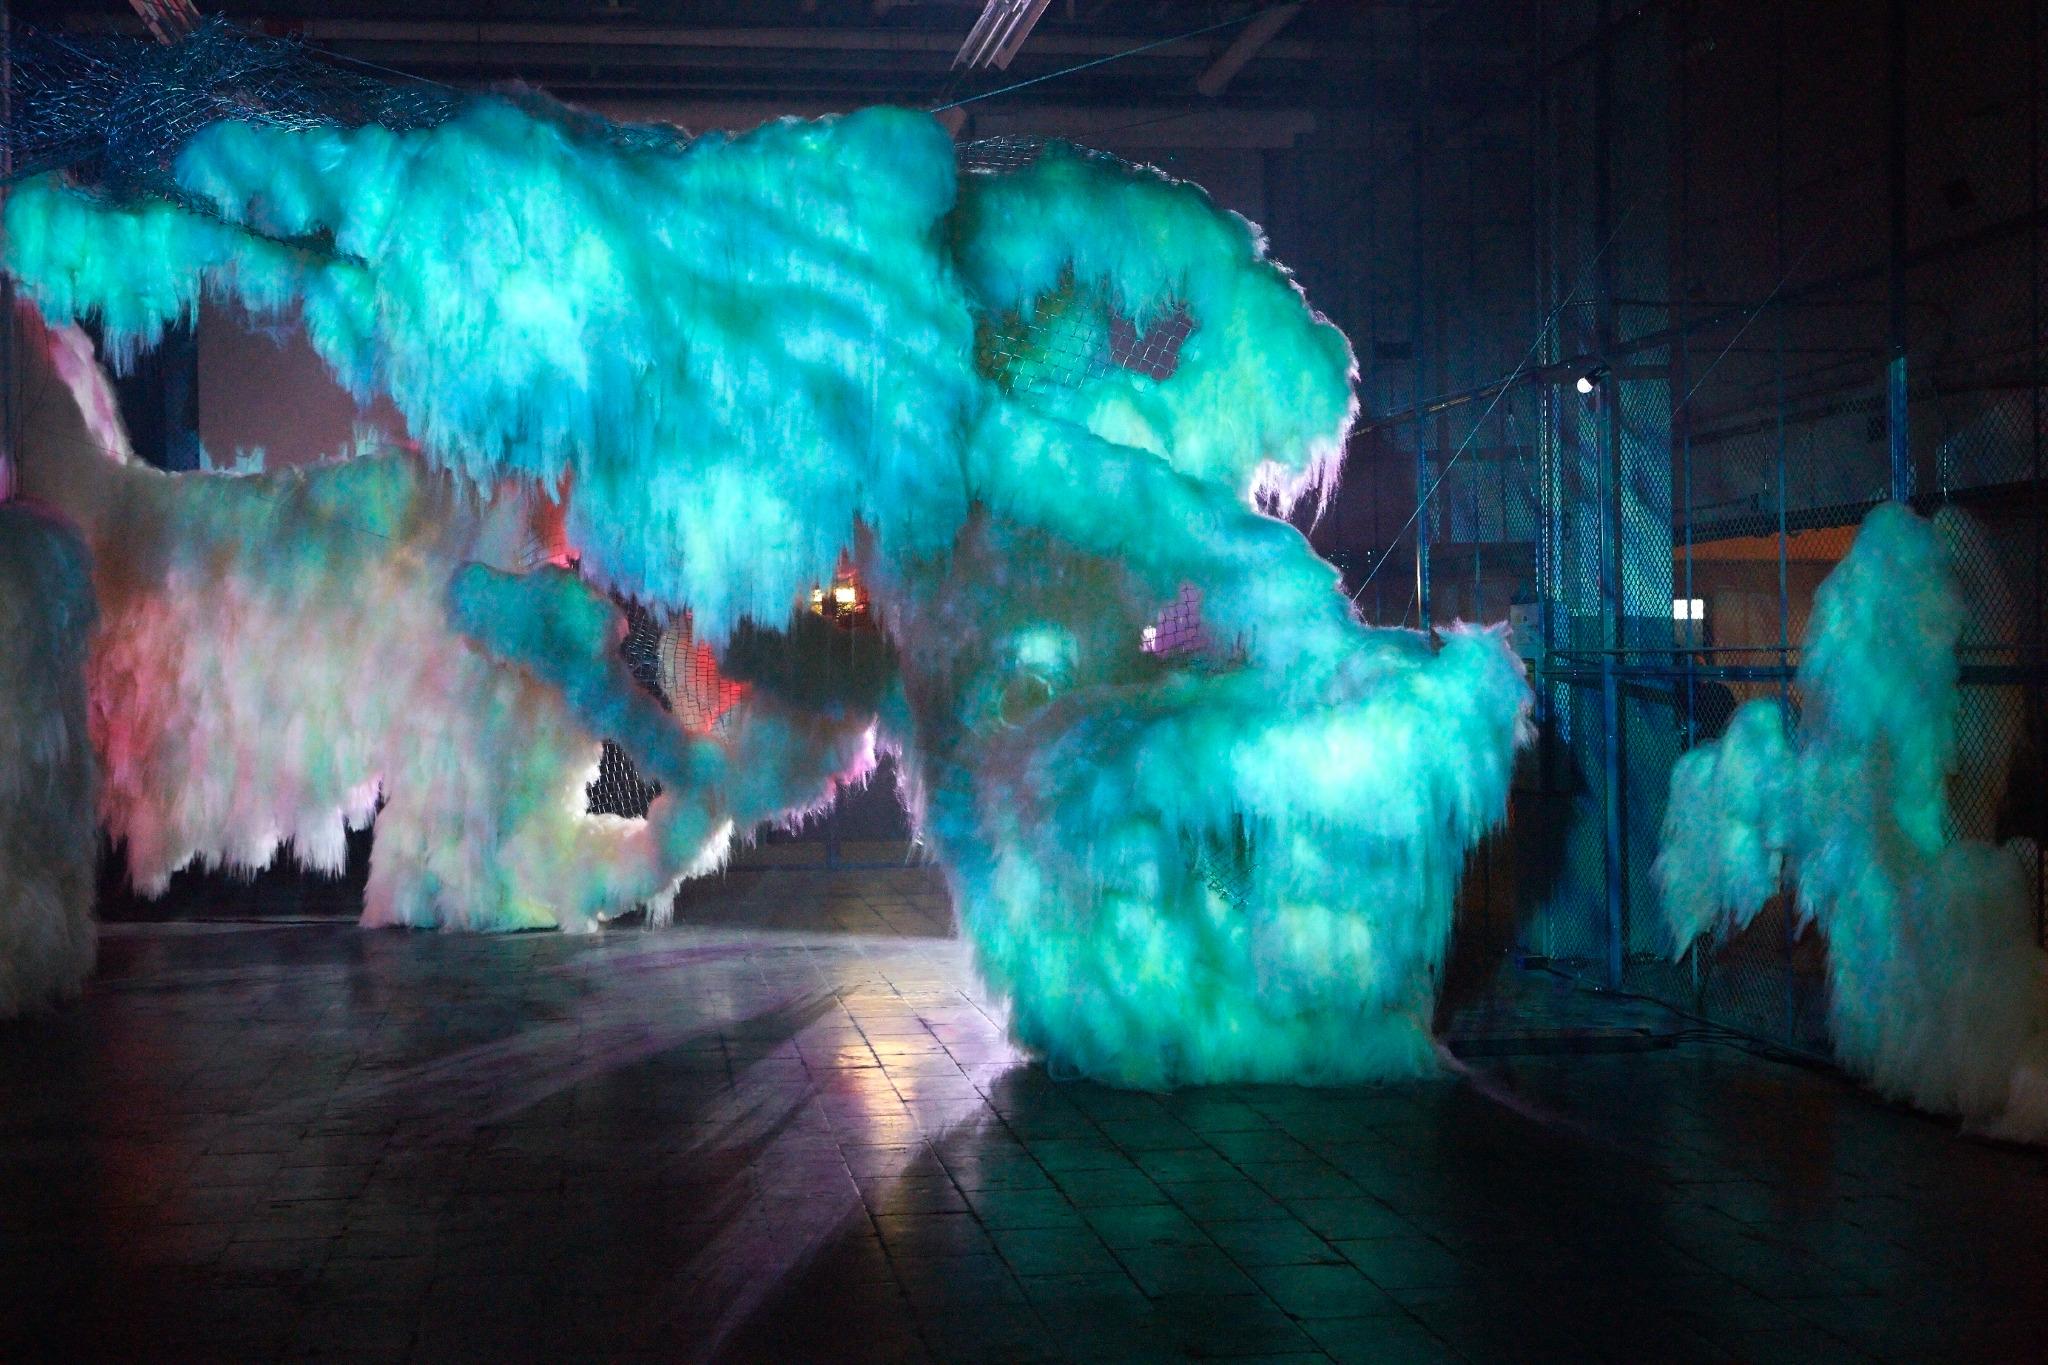 Ghostbeast.+Photo+by+Elisabet+Davidsdottir+5.jpg